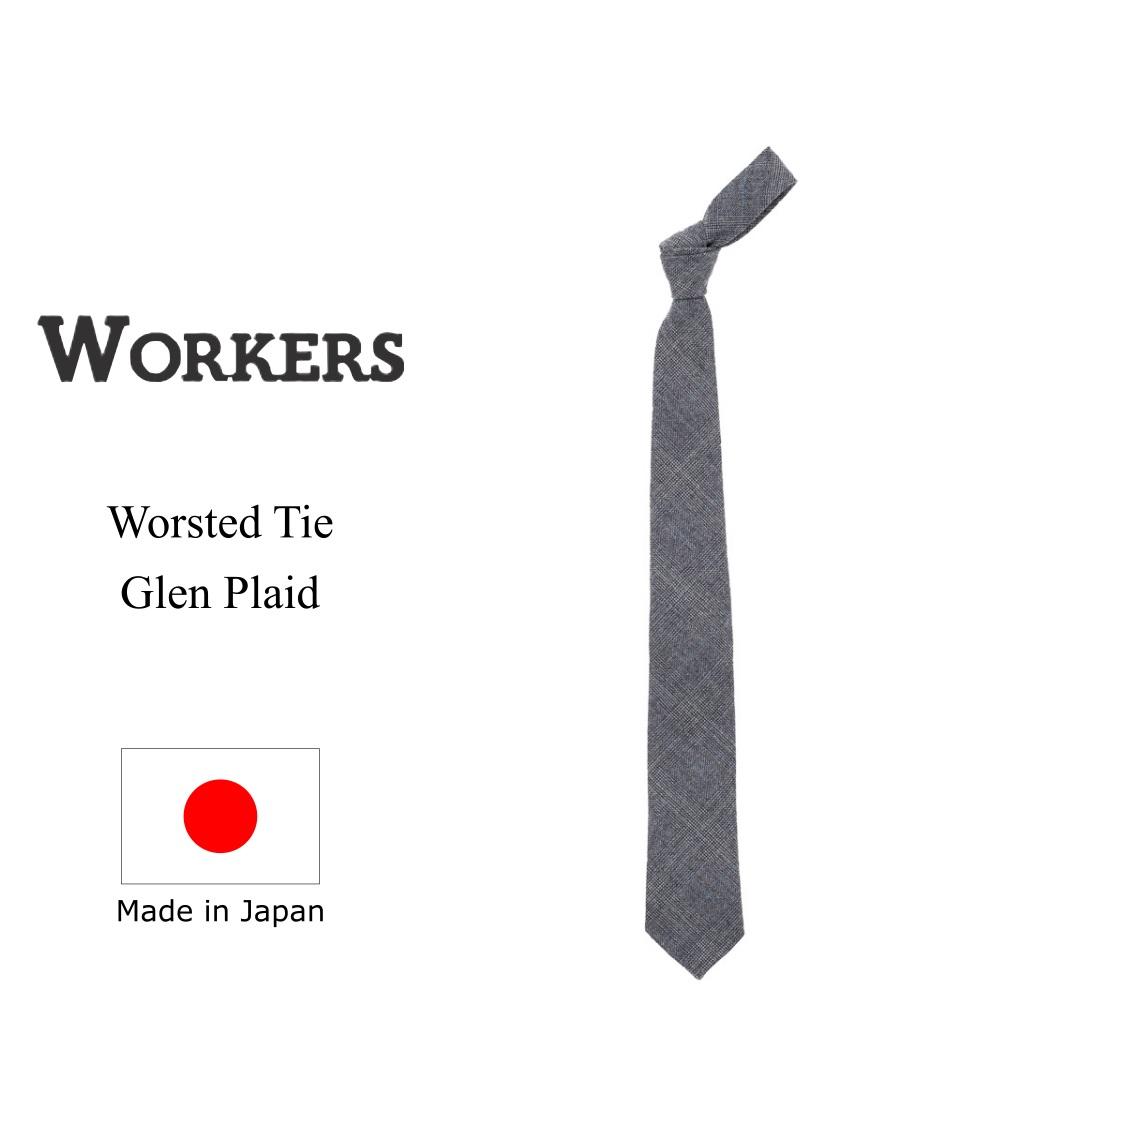 WORKERS ワーカーズ Worsted Tie ウーステッドタイ Glen Plaid